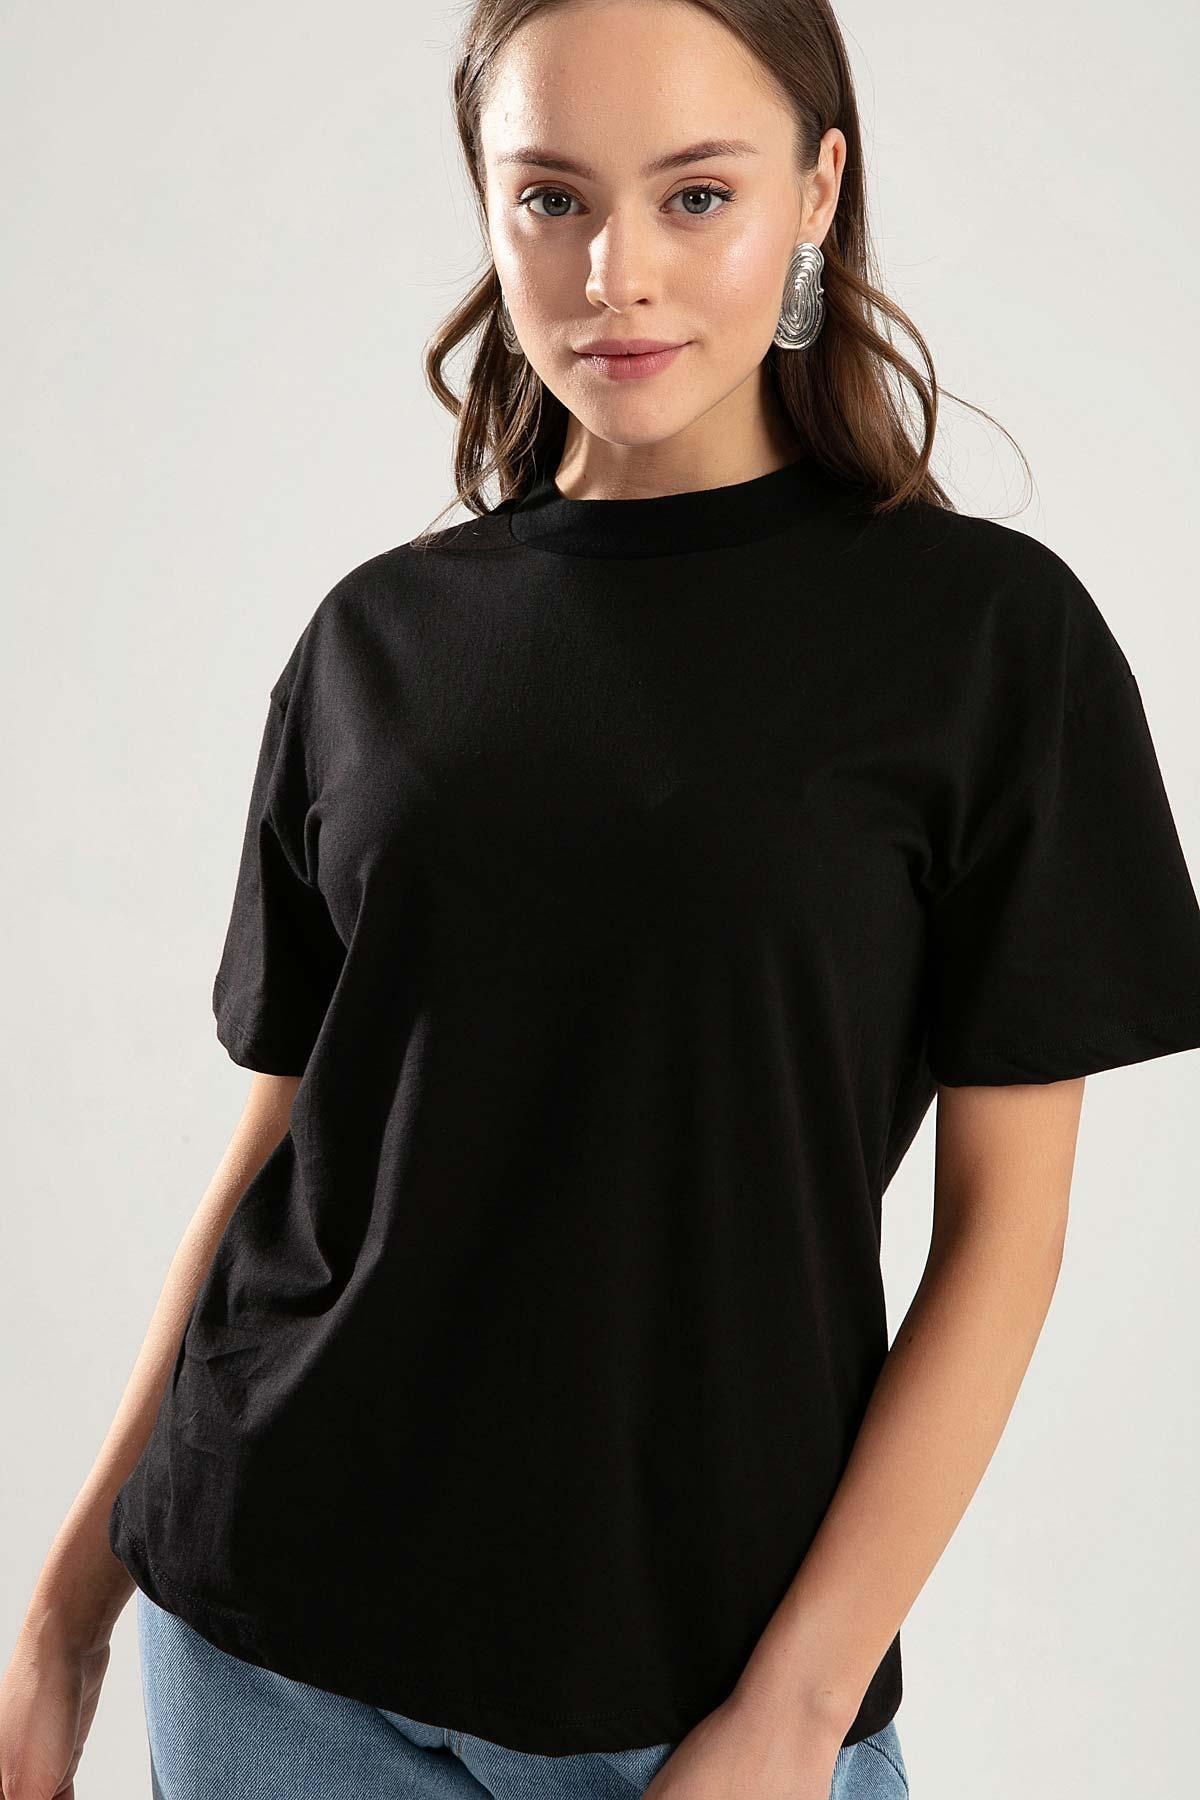 Pattaya Kadın Siyah Dik Yaka Basic Tişört PTTY20S-701 0